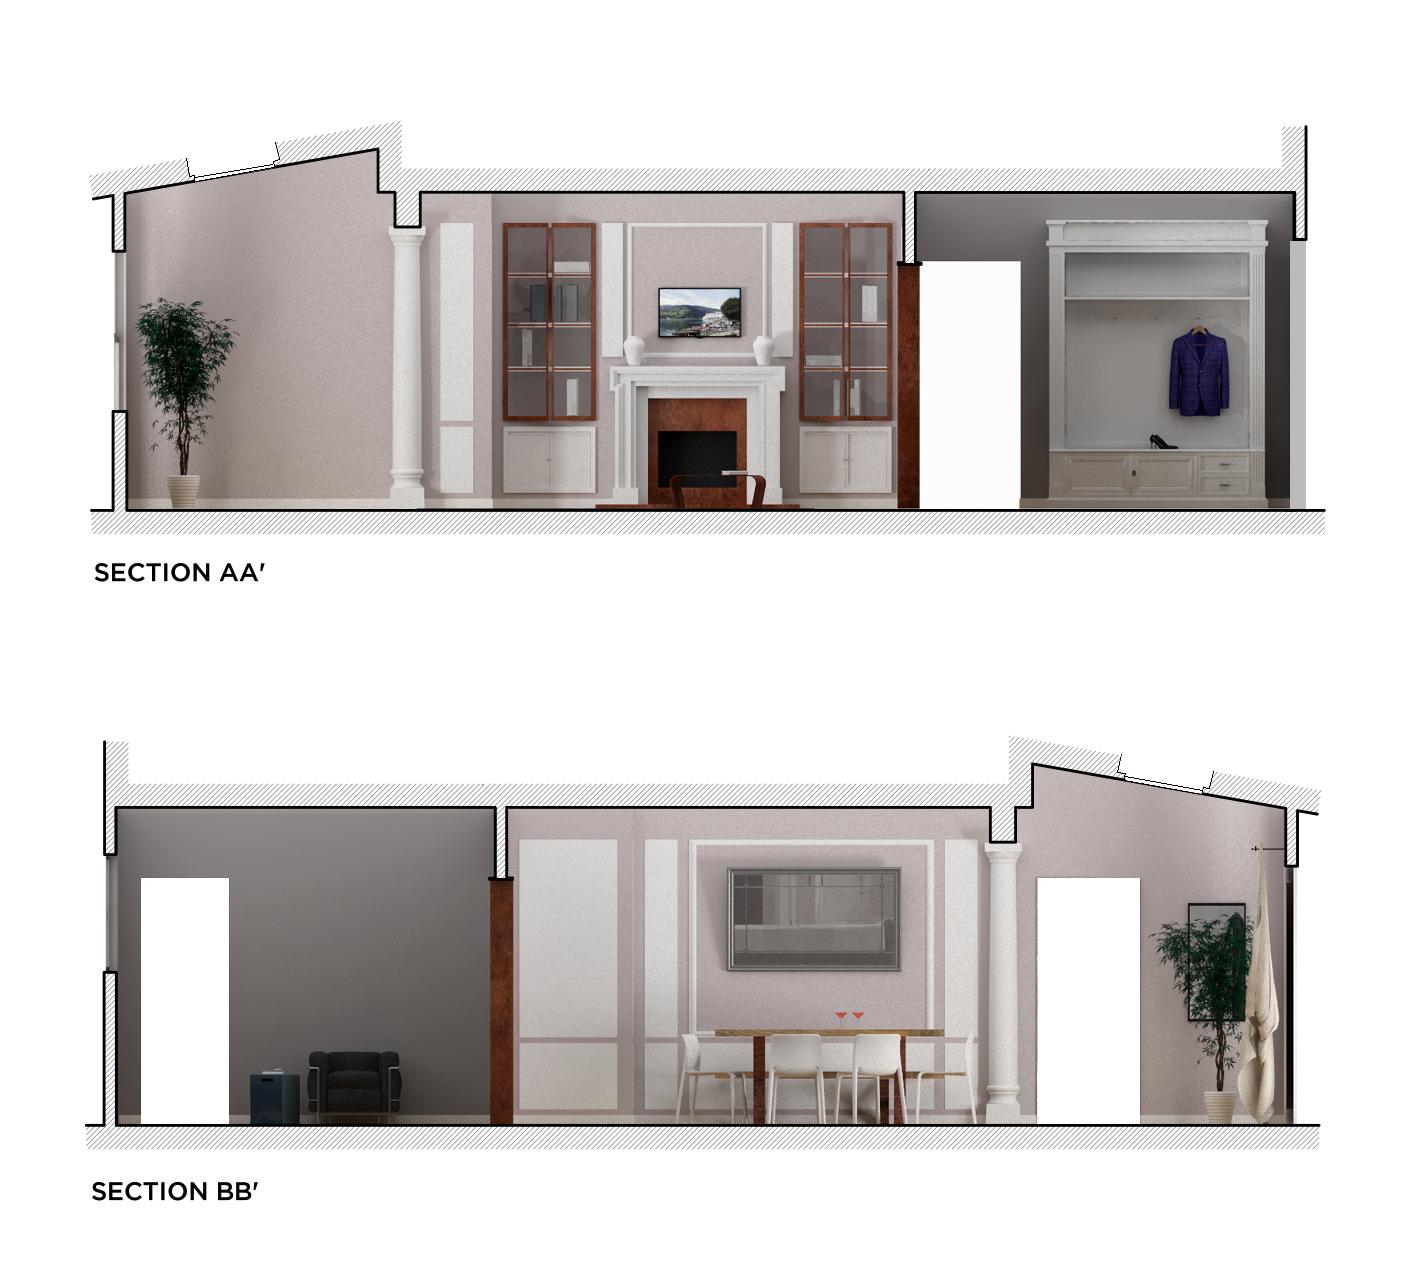 /Users/matteopasquini/Desktop/4. DESIGNING OUR HOME PART I/DESIG